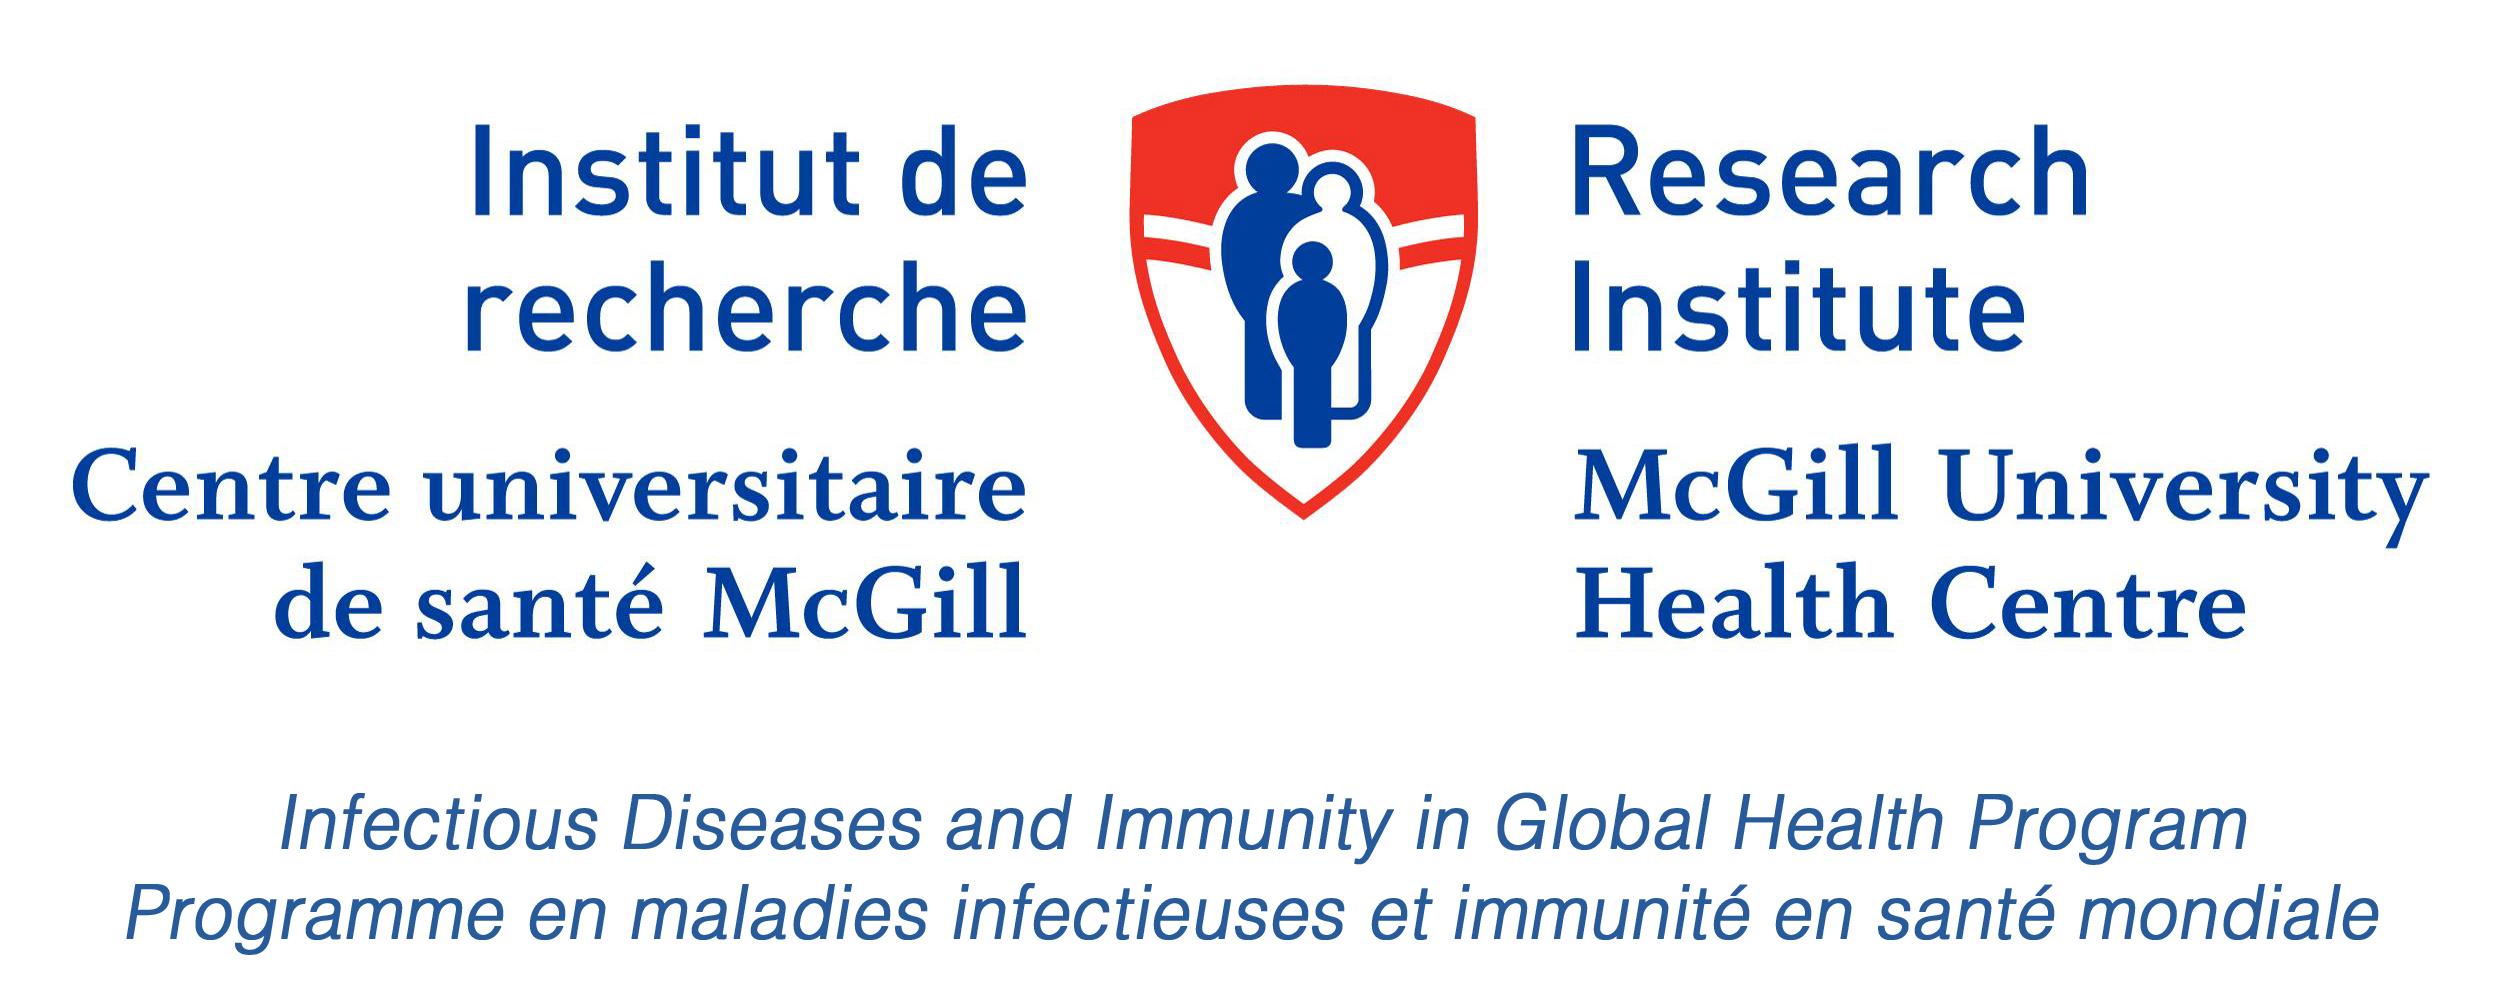 Infectious Diseases | Global Health Programs - McGill University